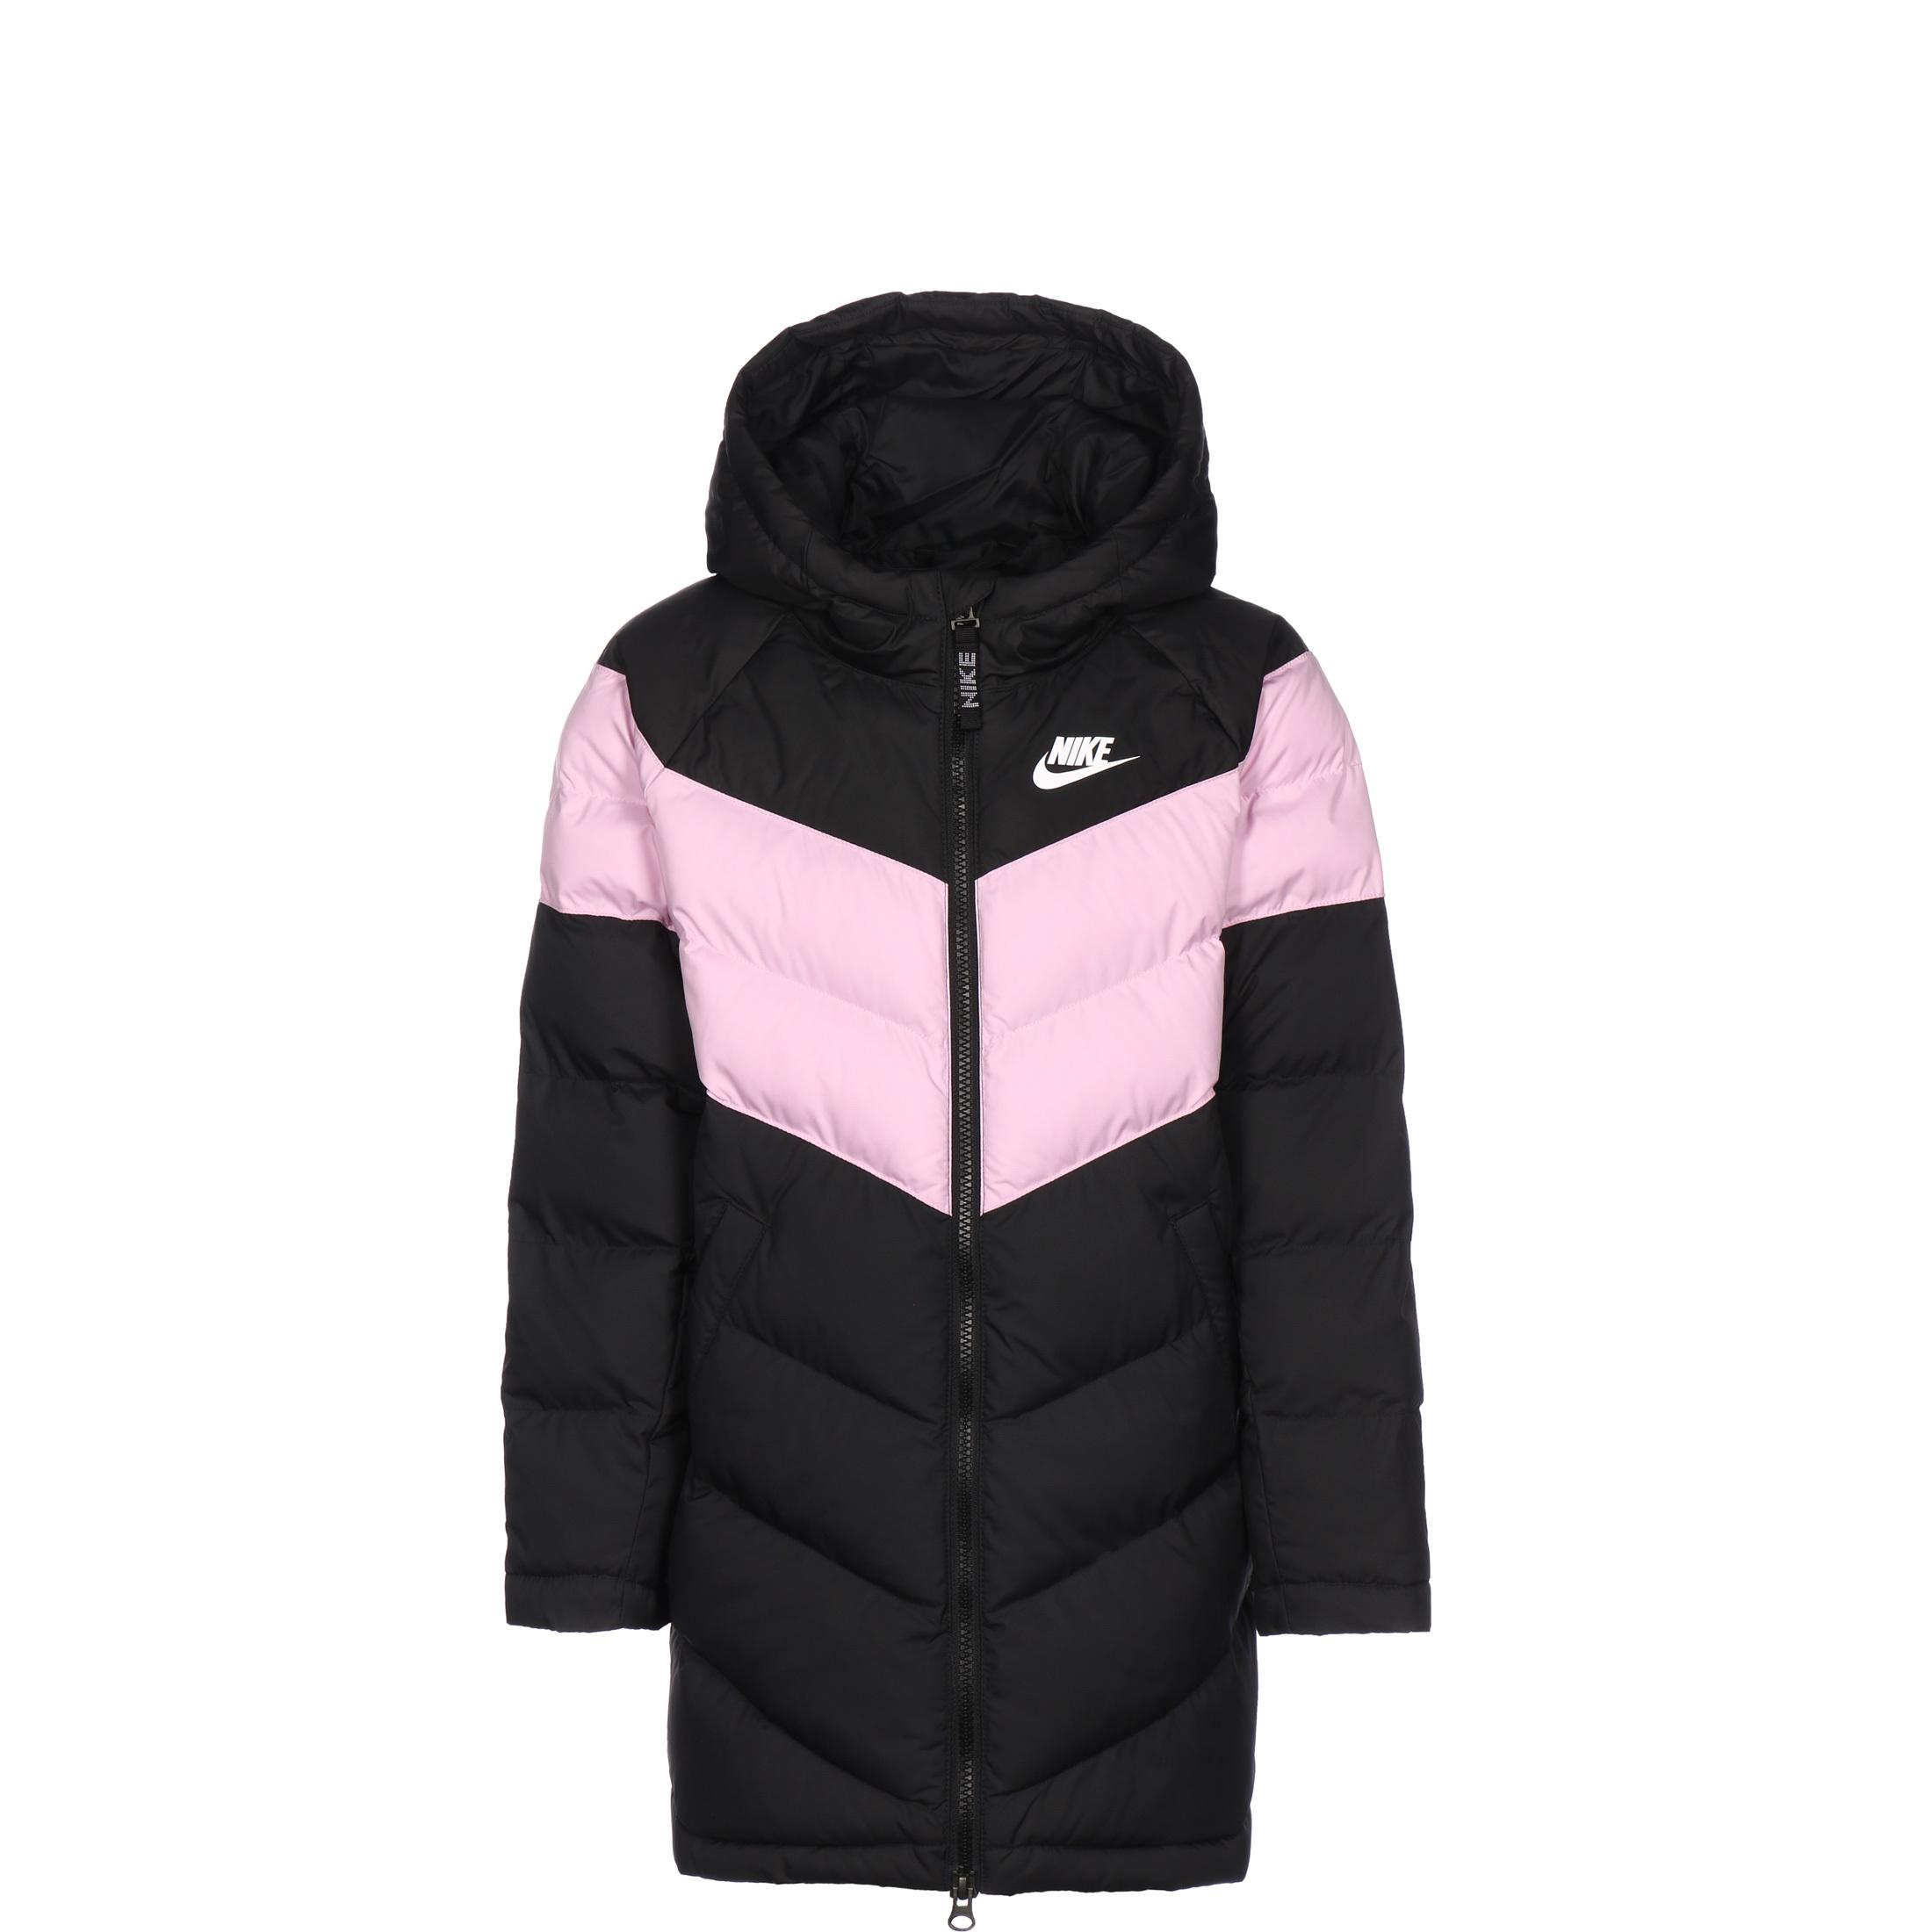 Big Kids' Synthetic-Fill Jacket L